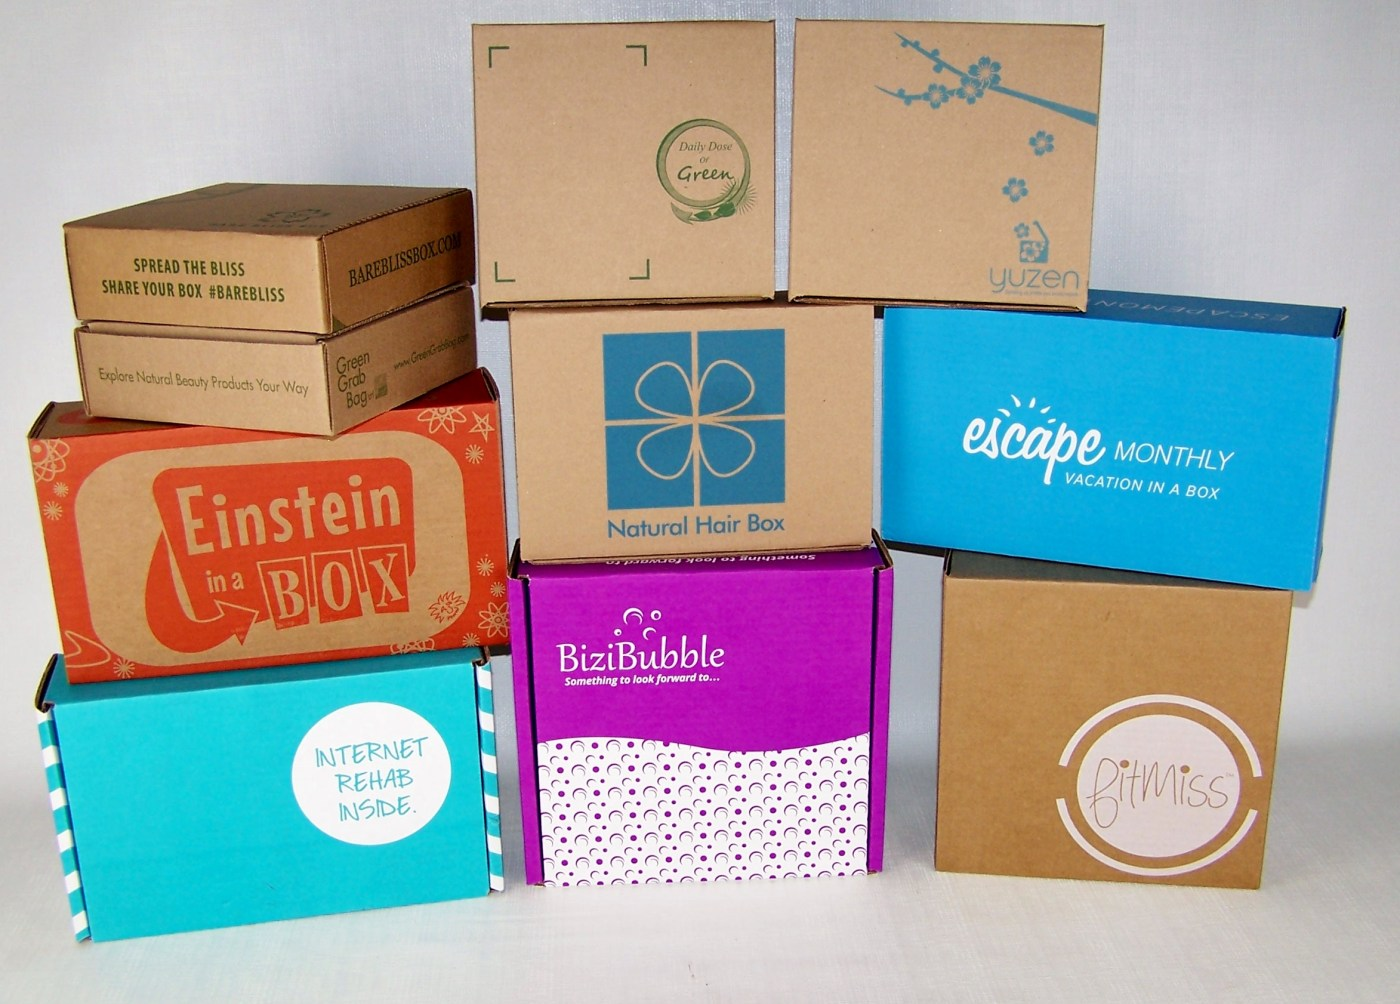 Ship subscription boxes internationally